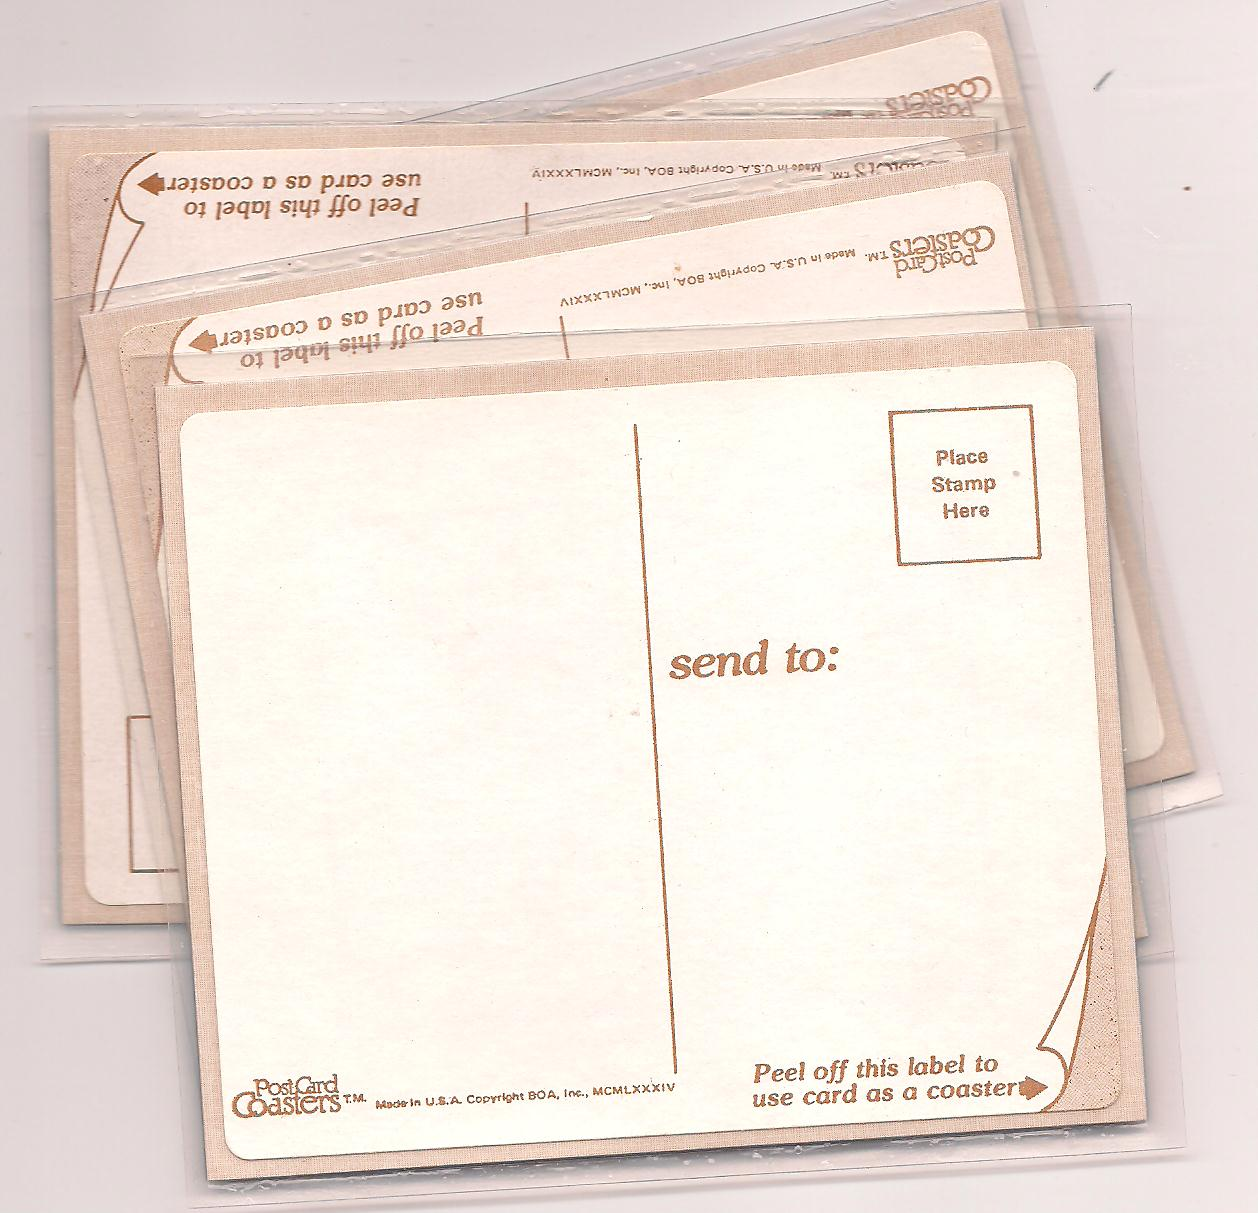 judy s postcards plus tuesday sharing day vesuvius postcard